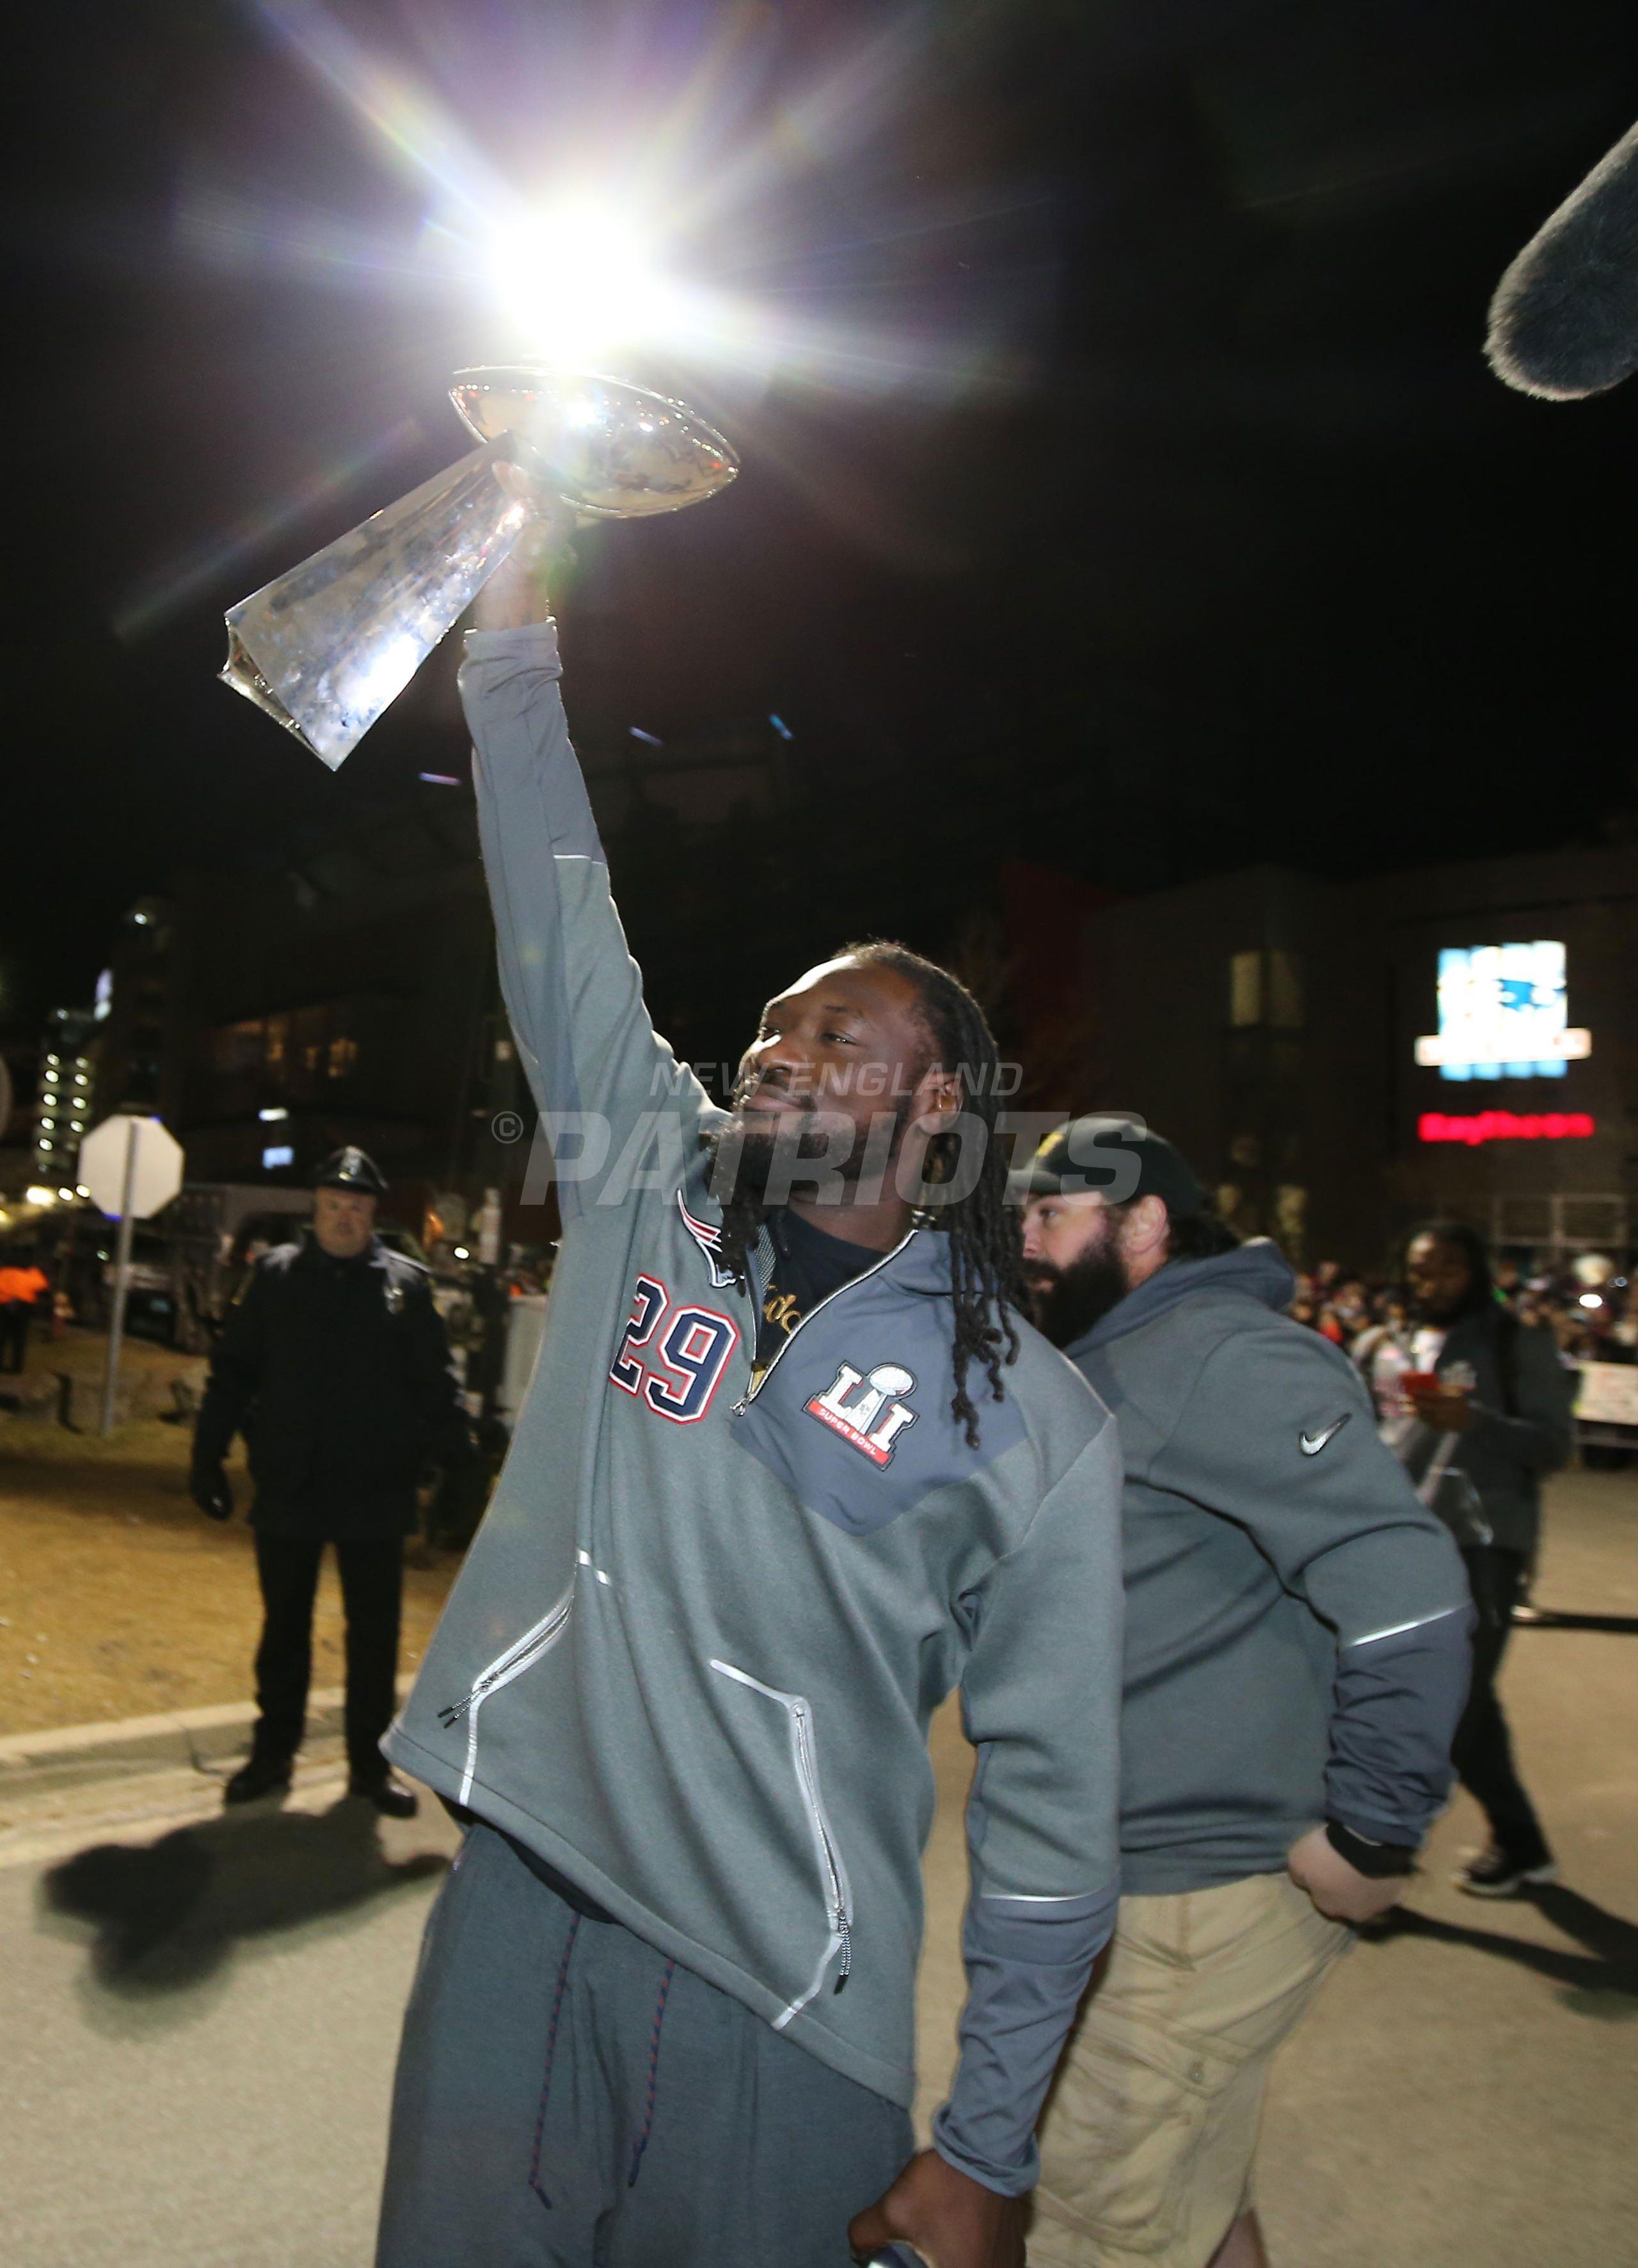 Silverman's Best presented by CarMax Super Bowl LI